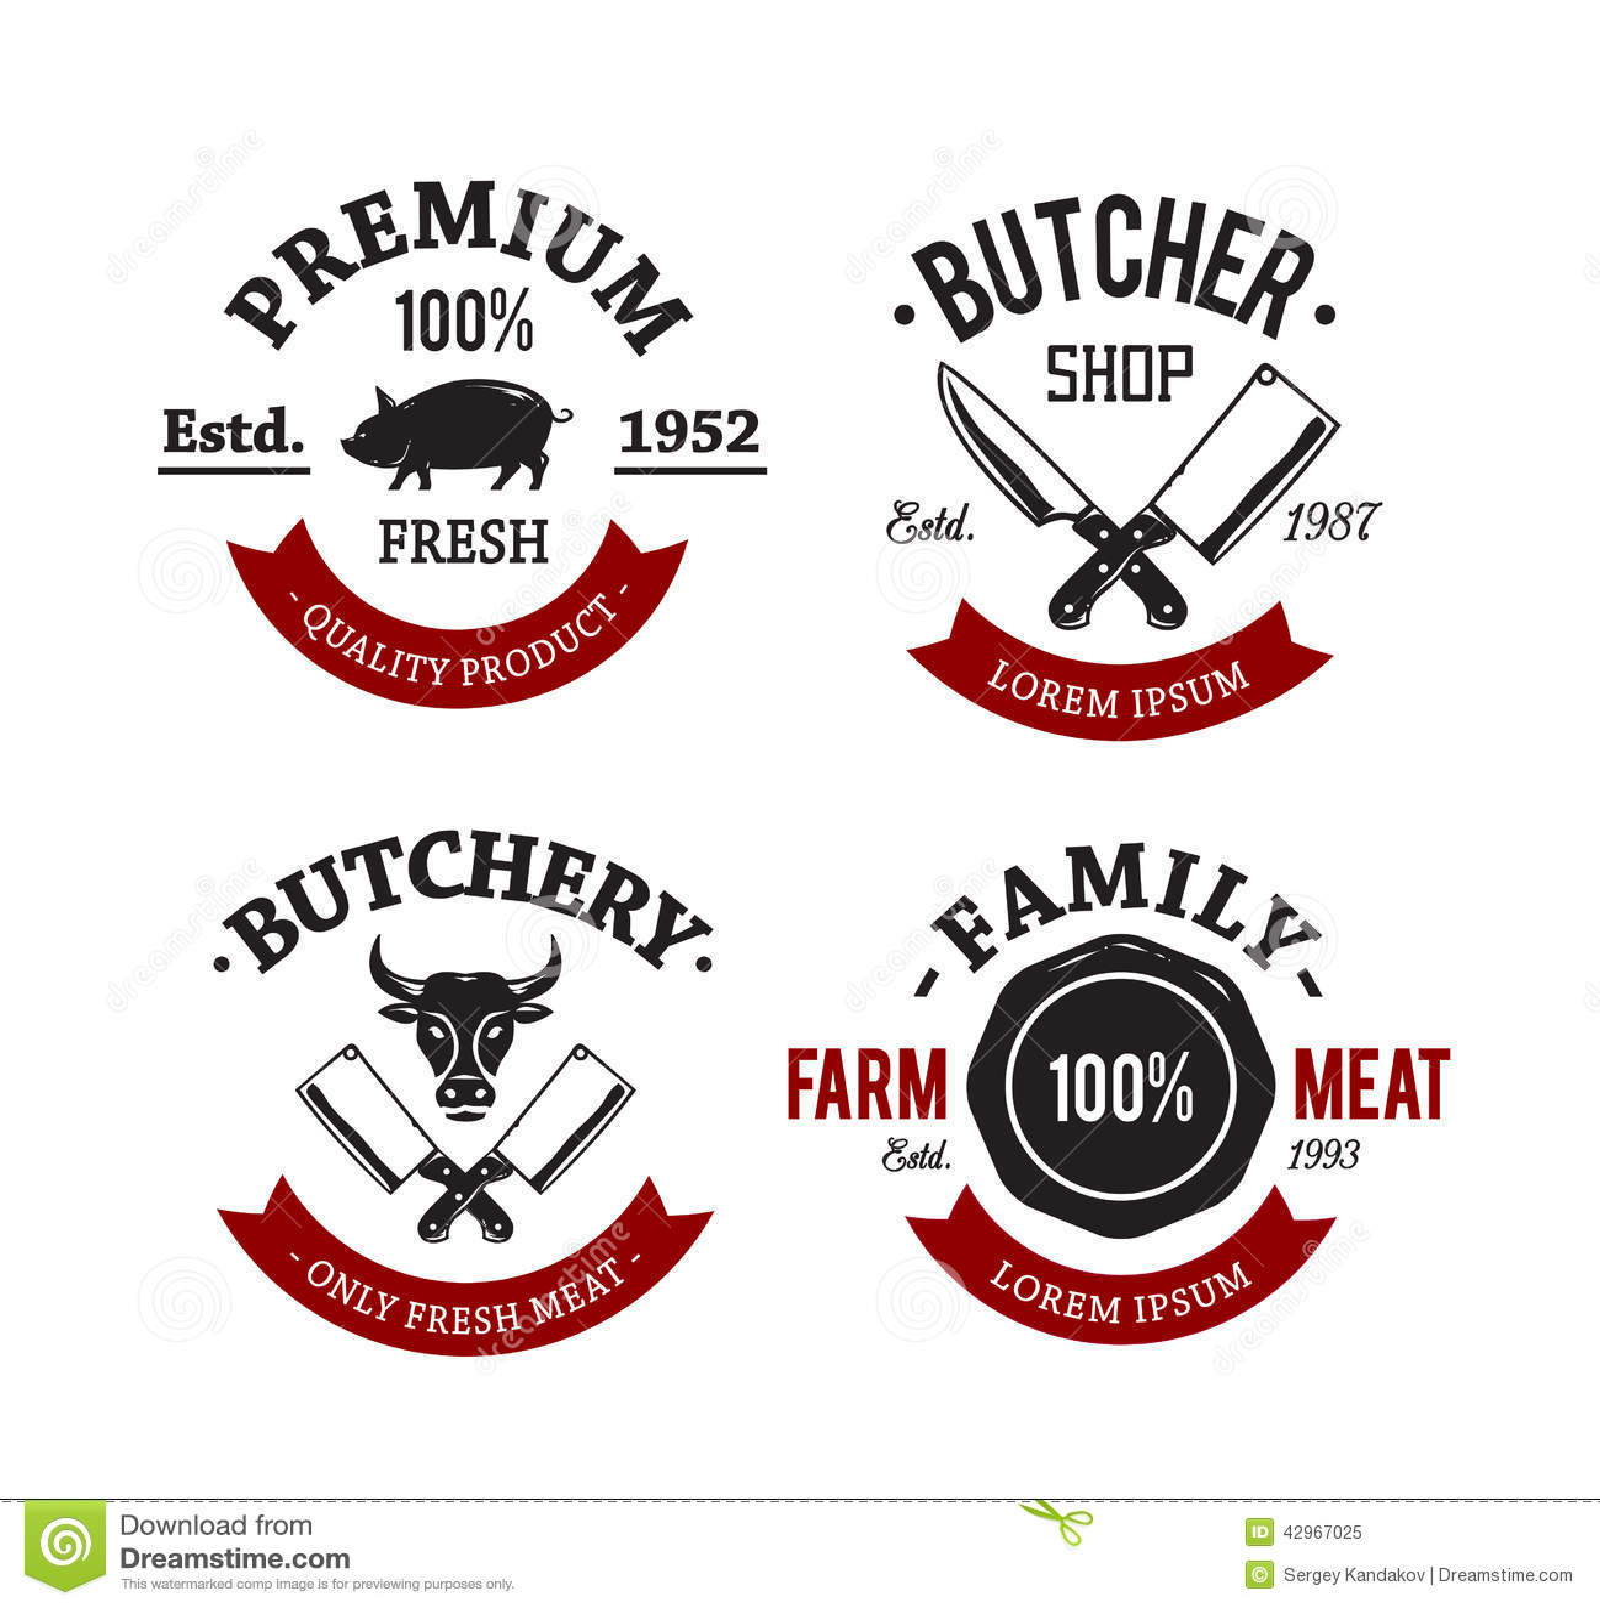 Butcher Shop Emblems Stock Vector - Image: 42967025